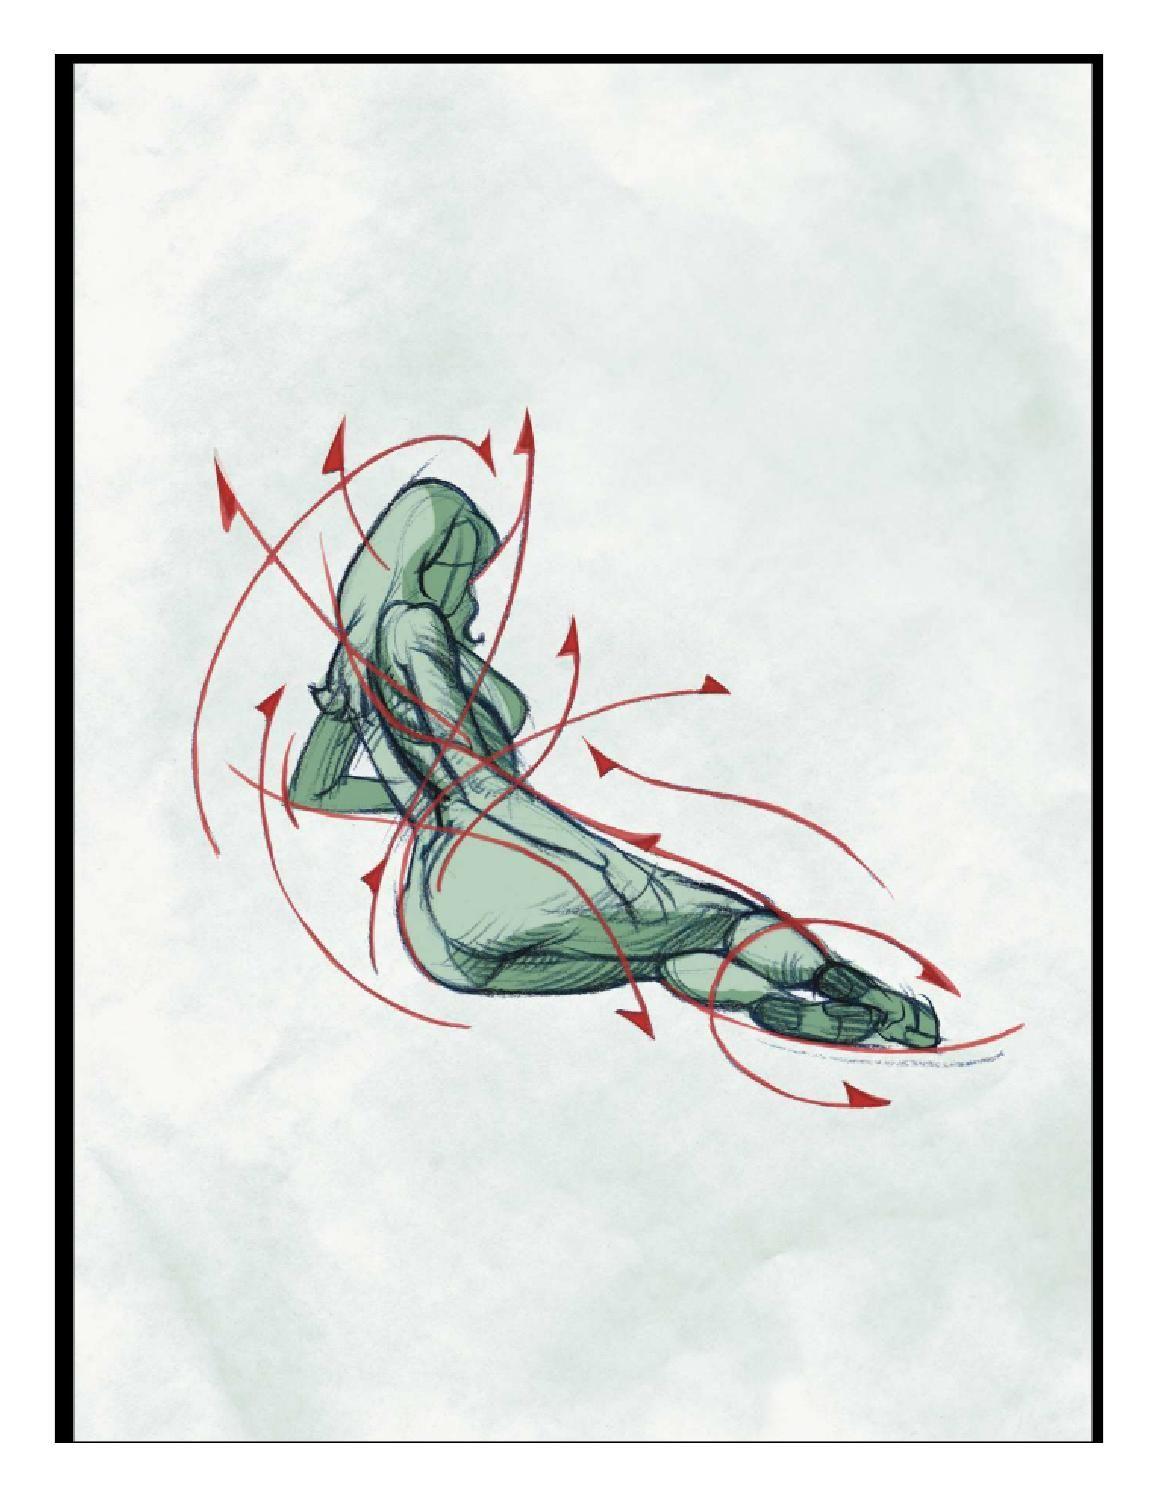 Imaginefx how to draw and paint anatomy vol 2 | Anatomy, Figure ...